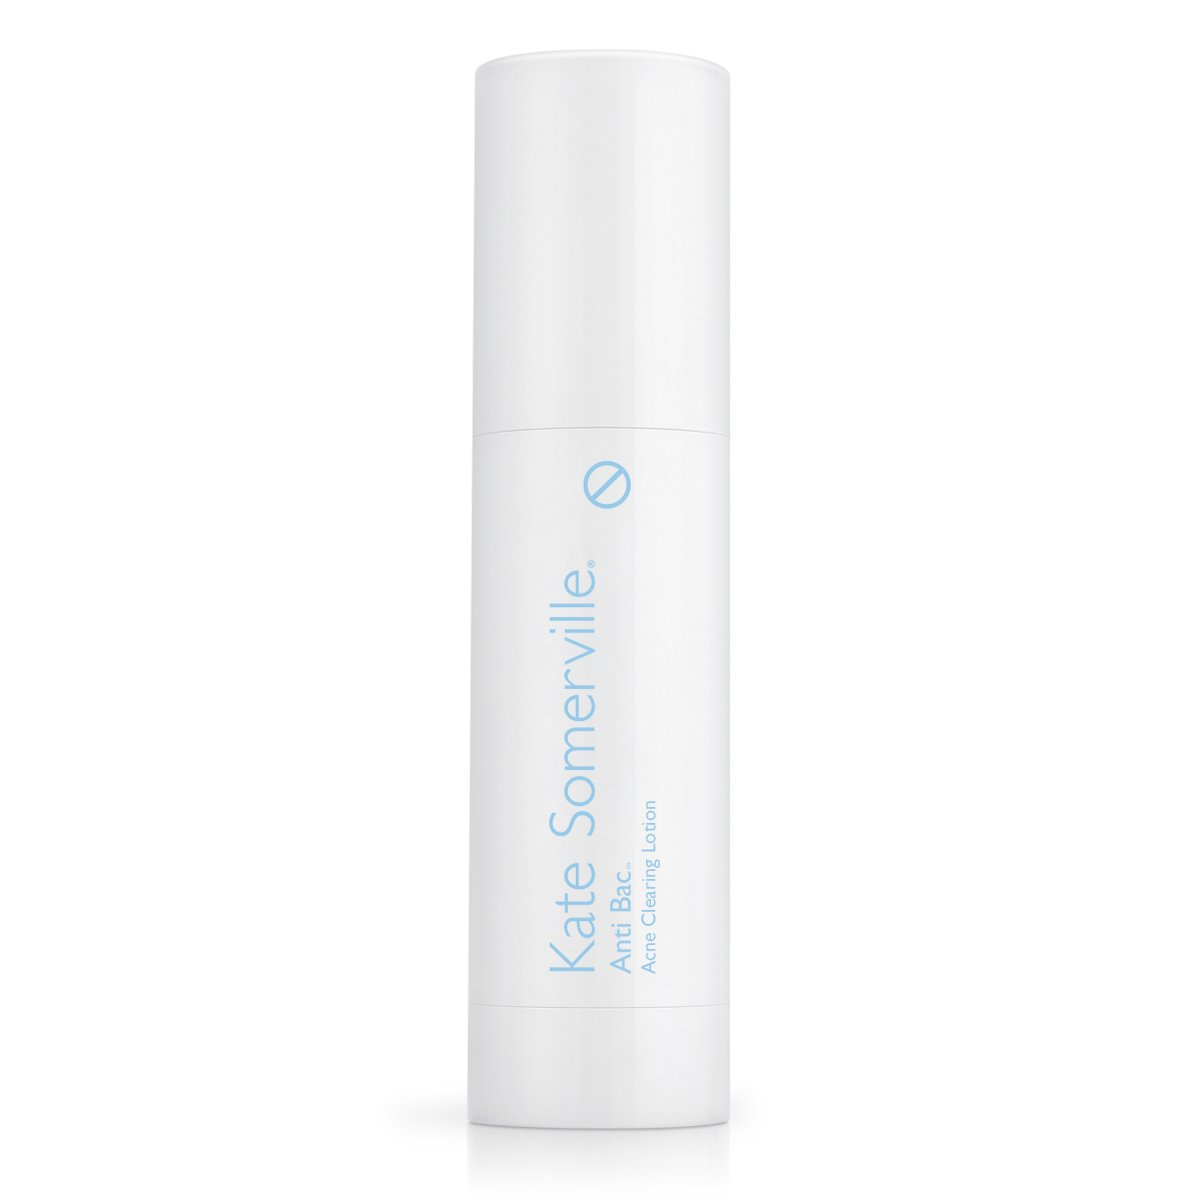 Kate Somerville Anti Bac Acne Clearing Lotion Acne Treatment - Benzoyl Peroxide Acne Cream (1.7 Fl. Oz.)